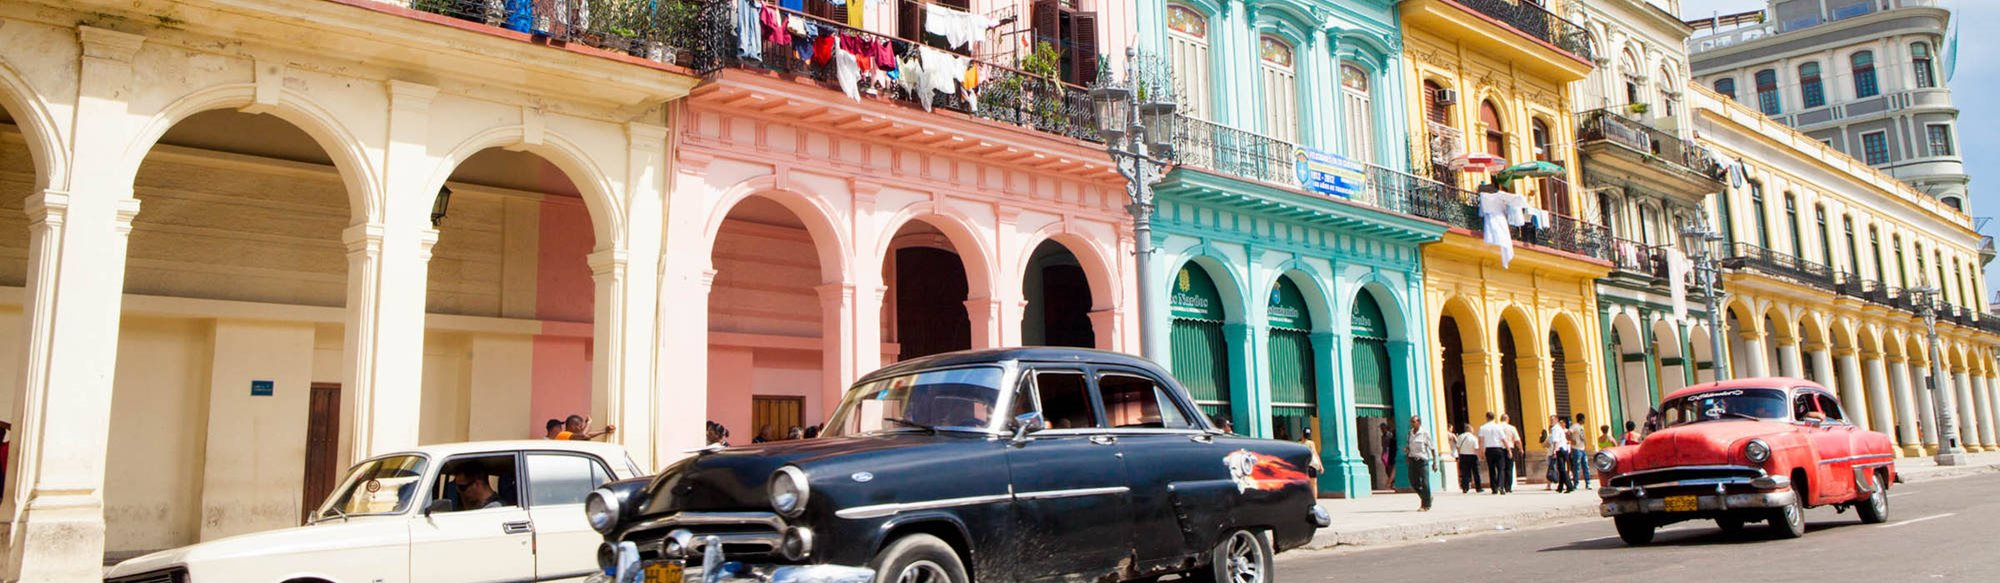 Dating i kubansk kultur